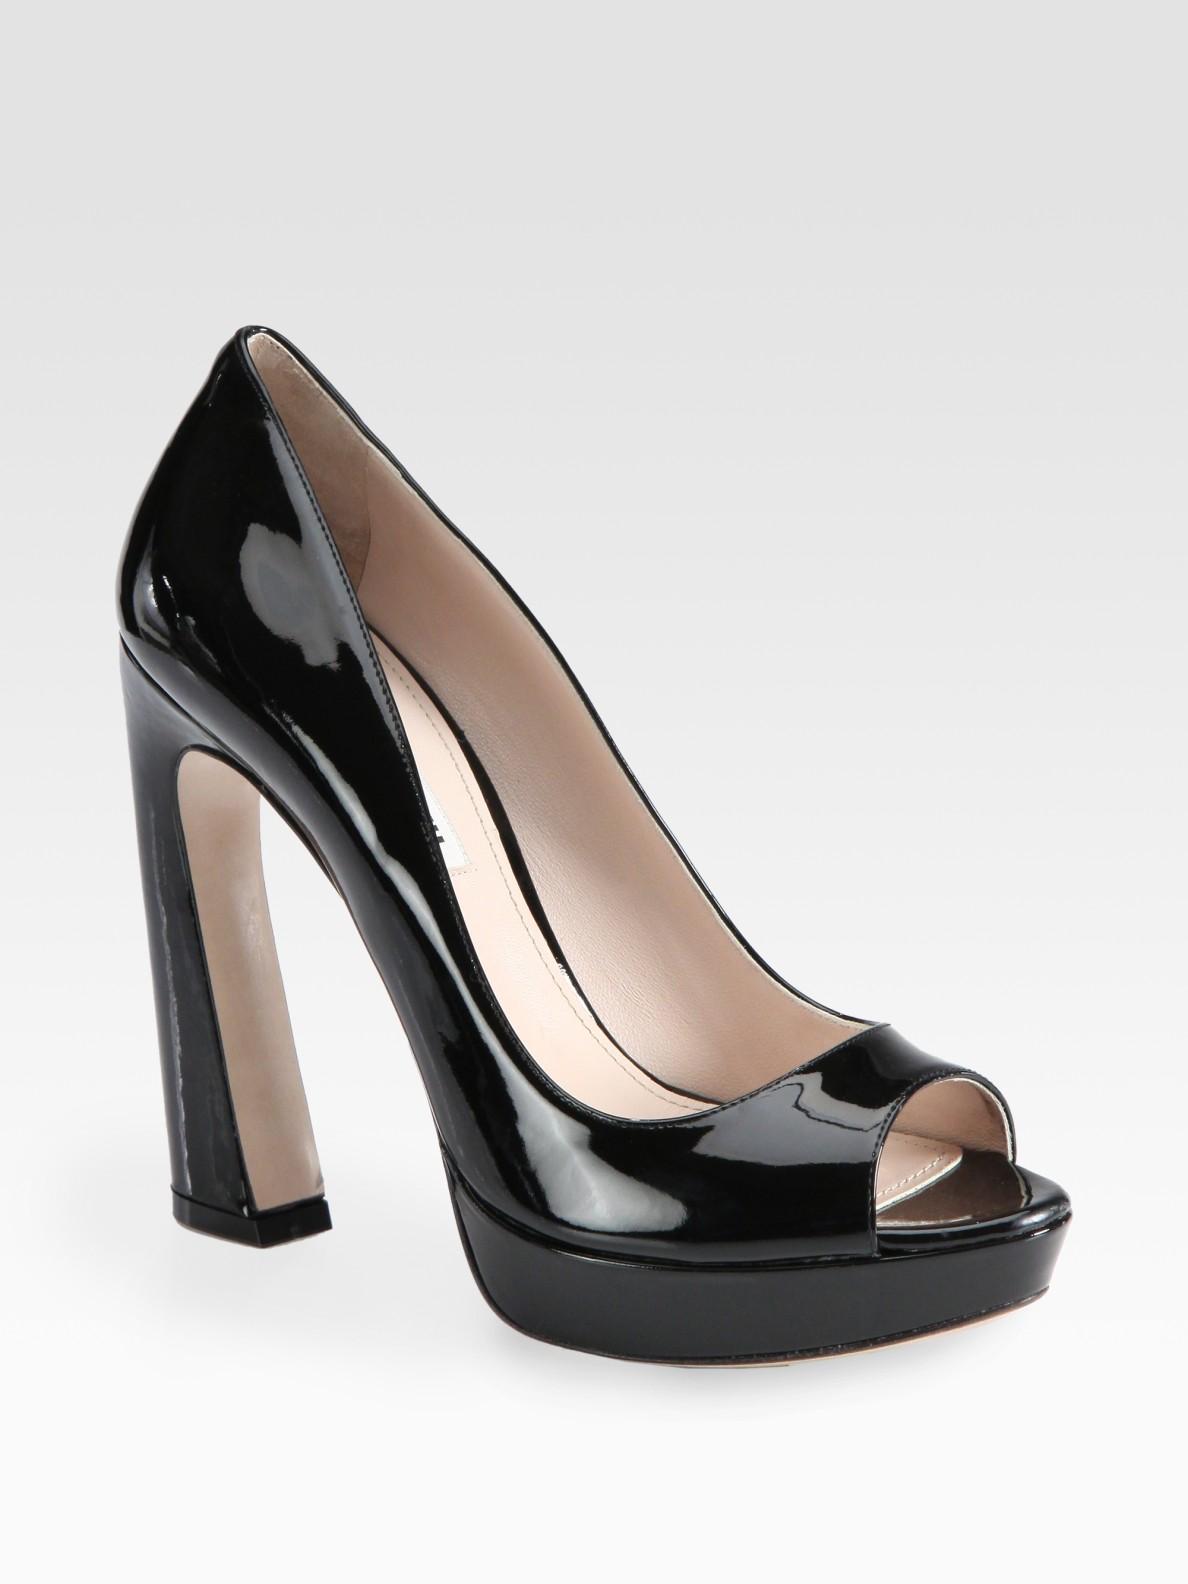 6435af929e8 Lyst - Miu Miu Patent Leather Peep Toe Flared Heel Pumps in Black